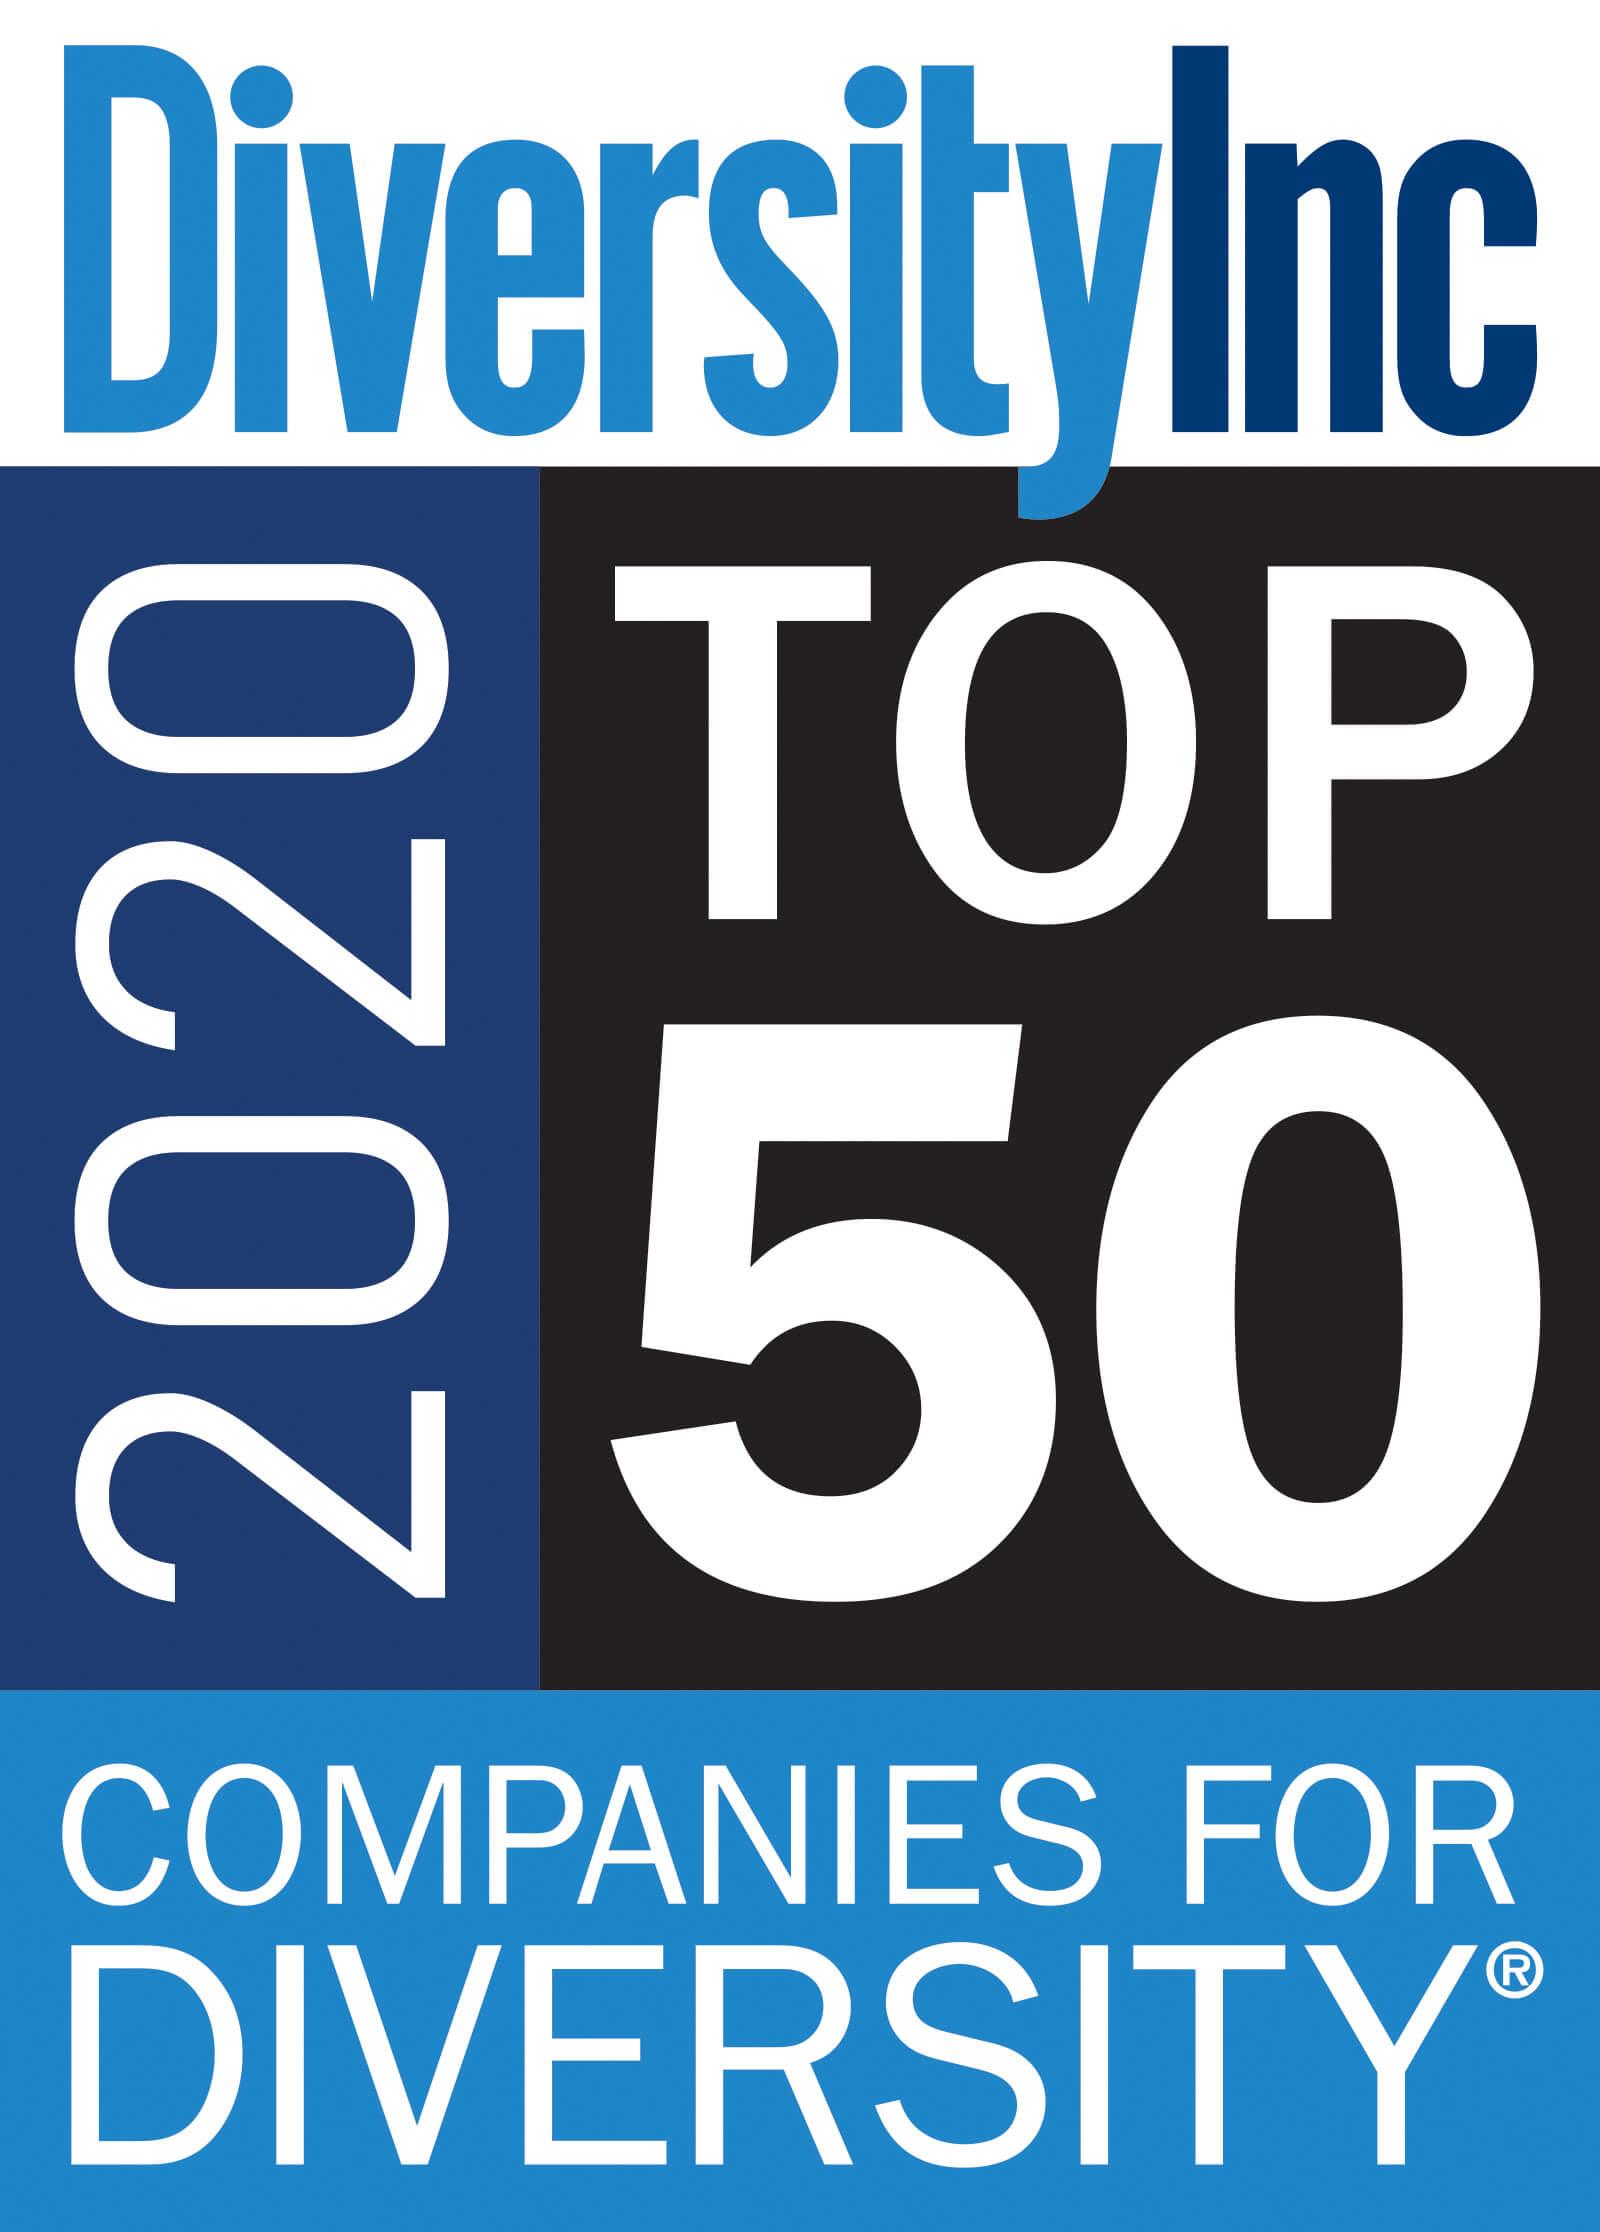 Top 50 Company for Diversity | DiversityInc